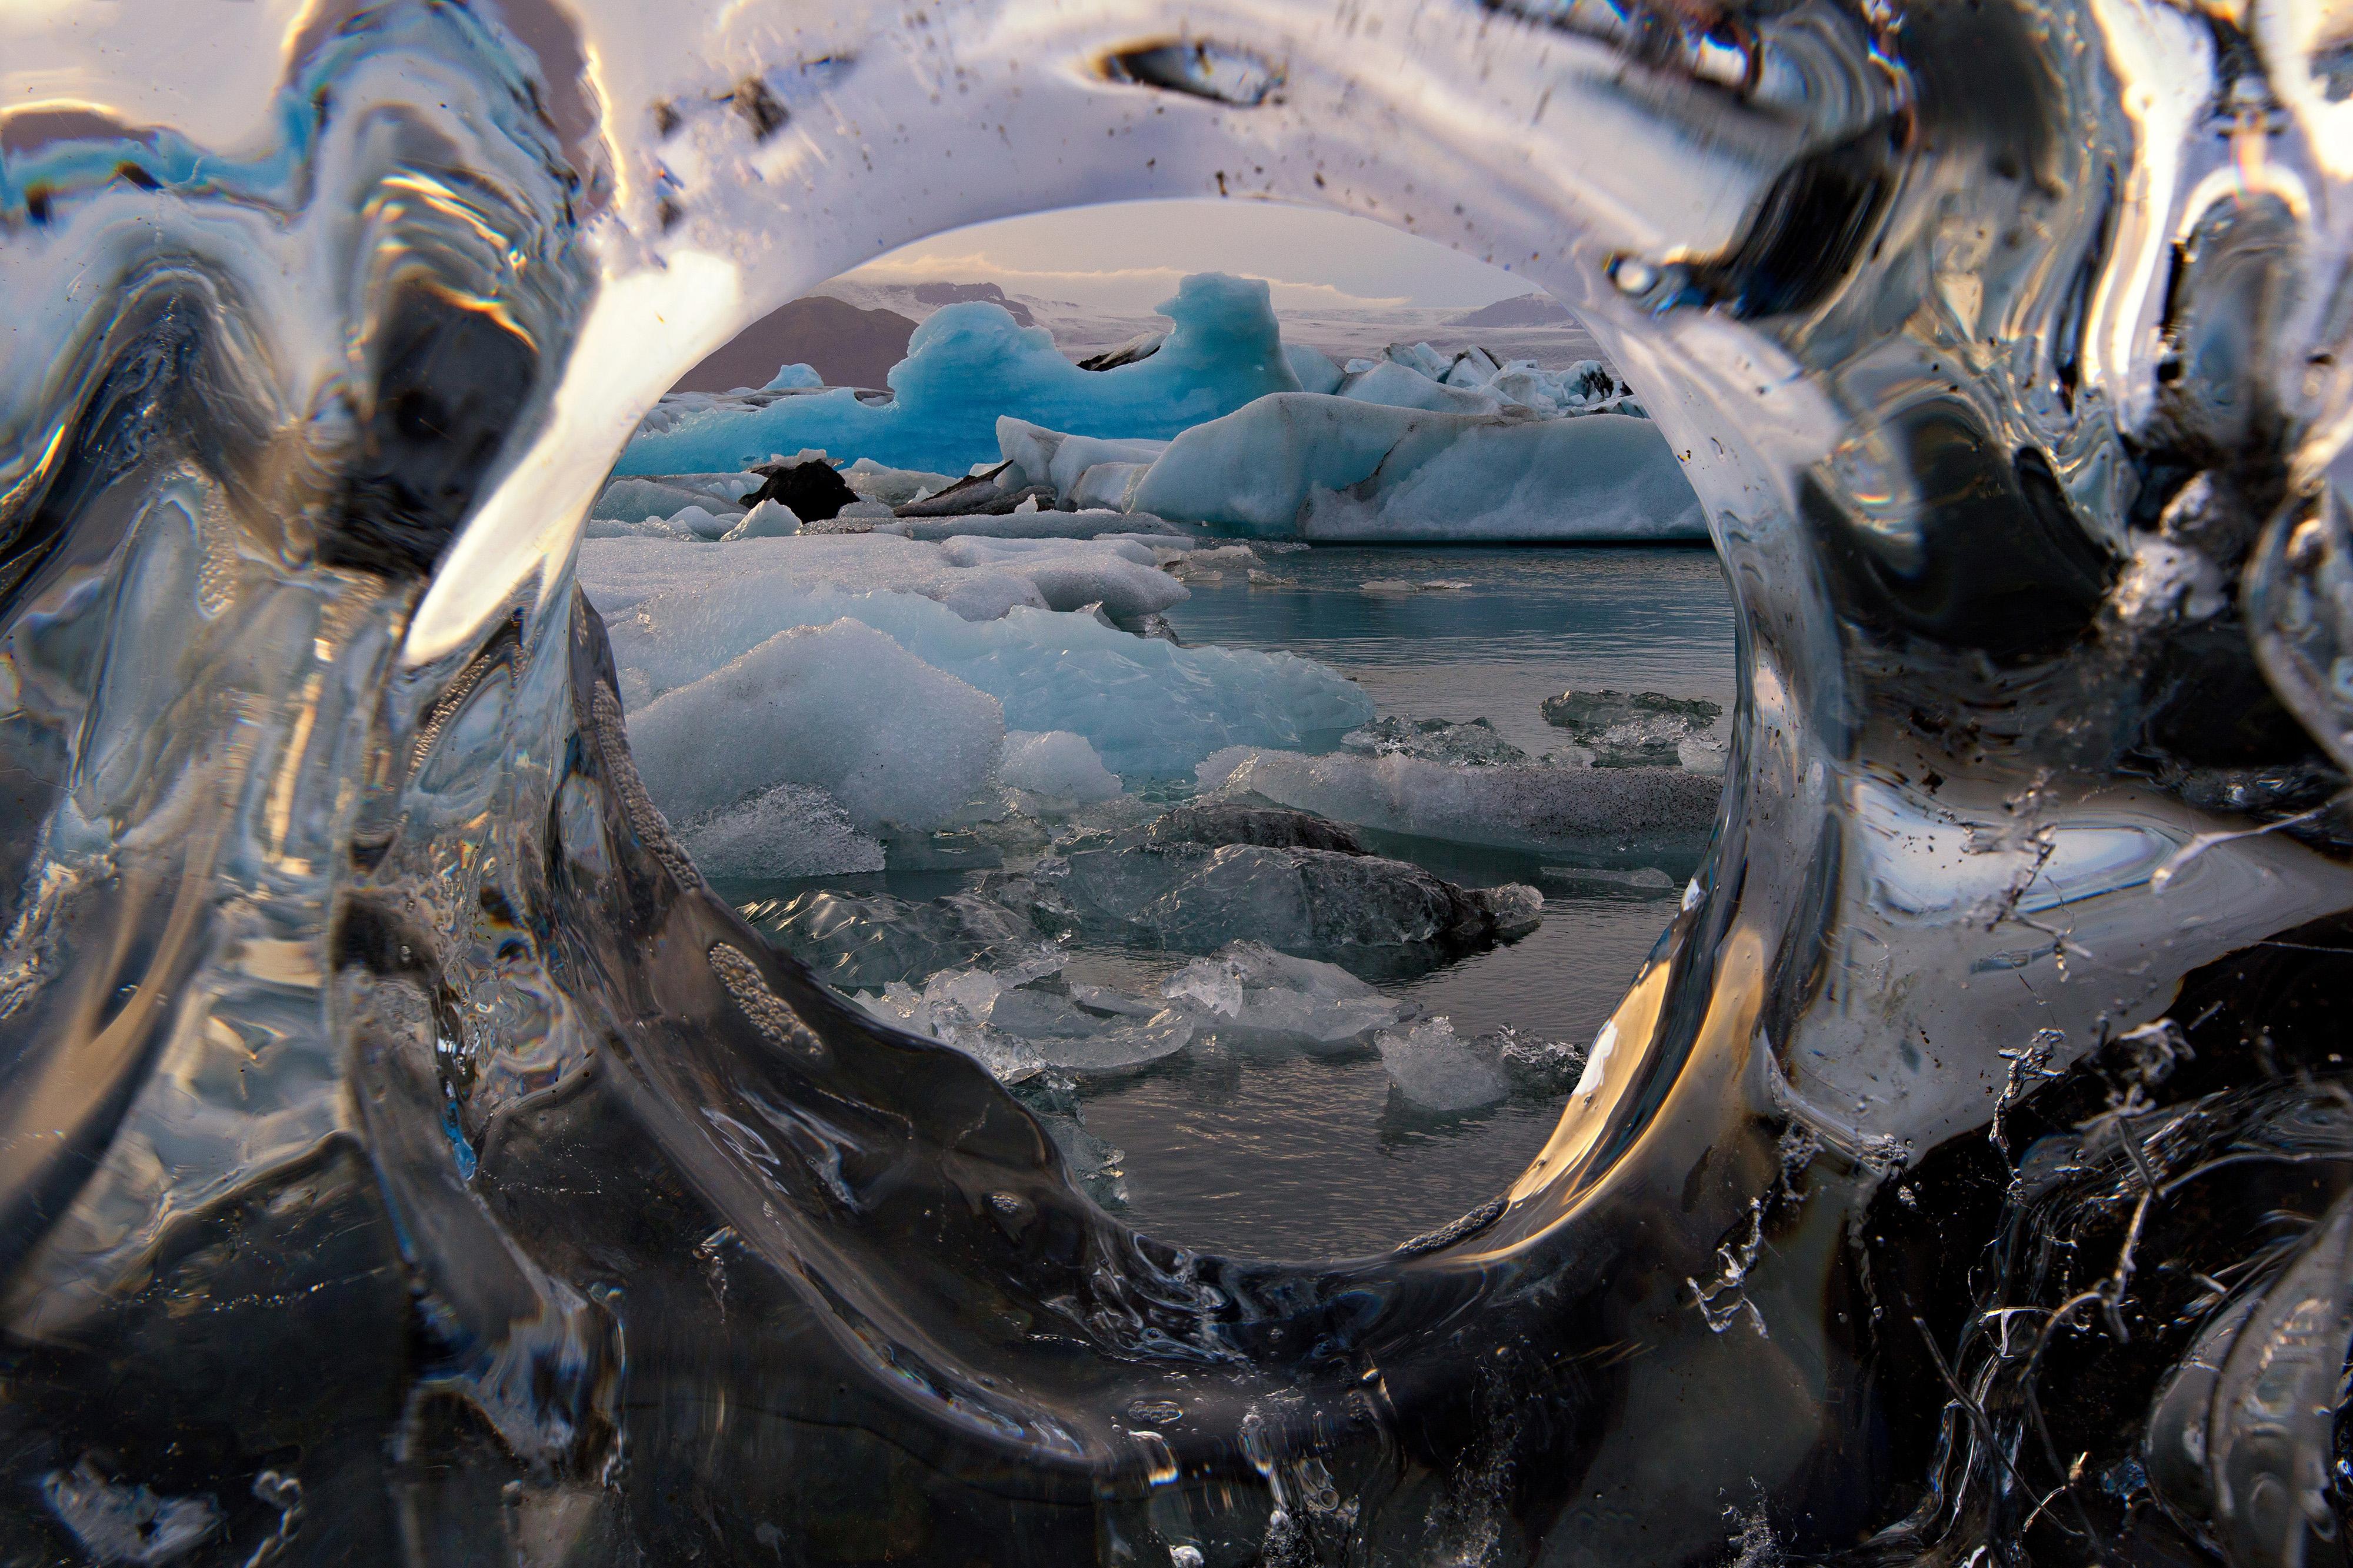 Iception at Jökulsárlón glacier lagoon.